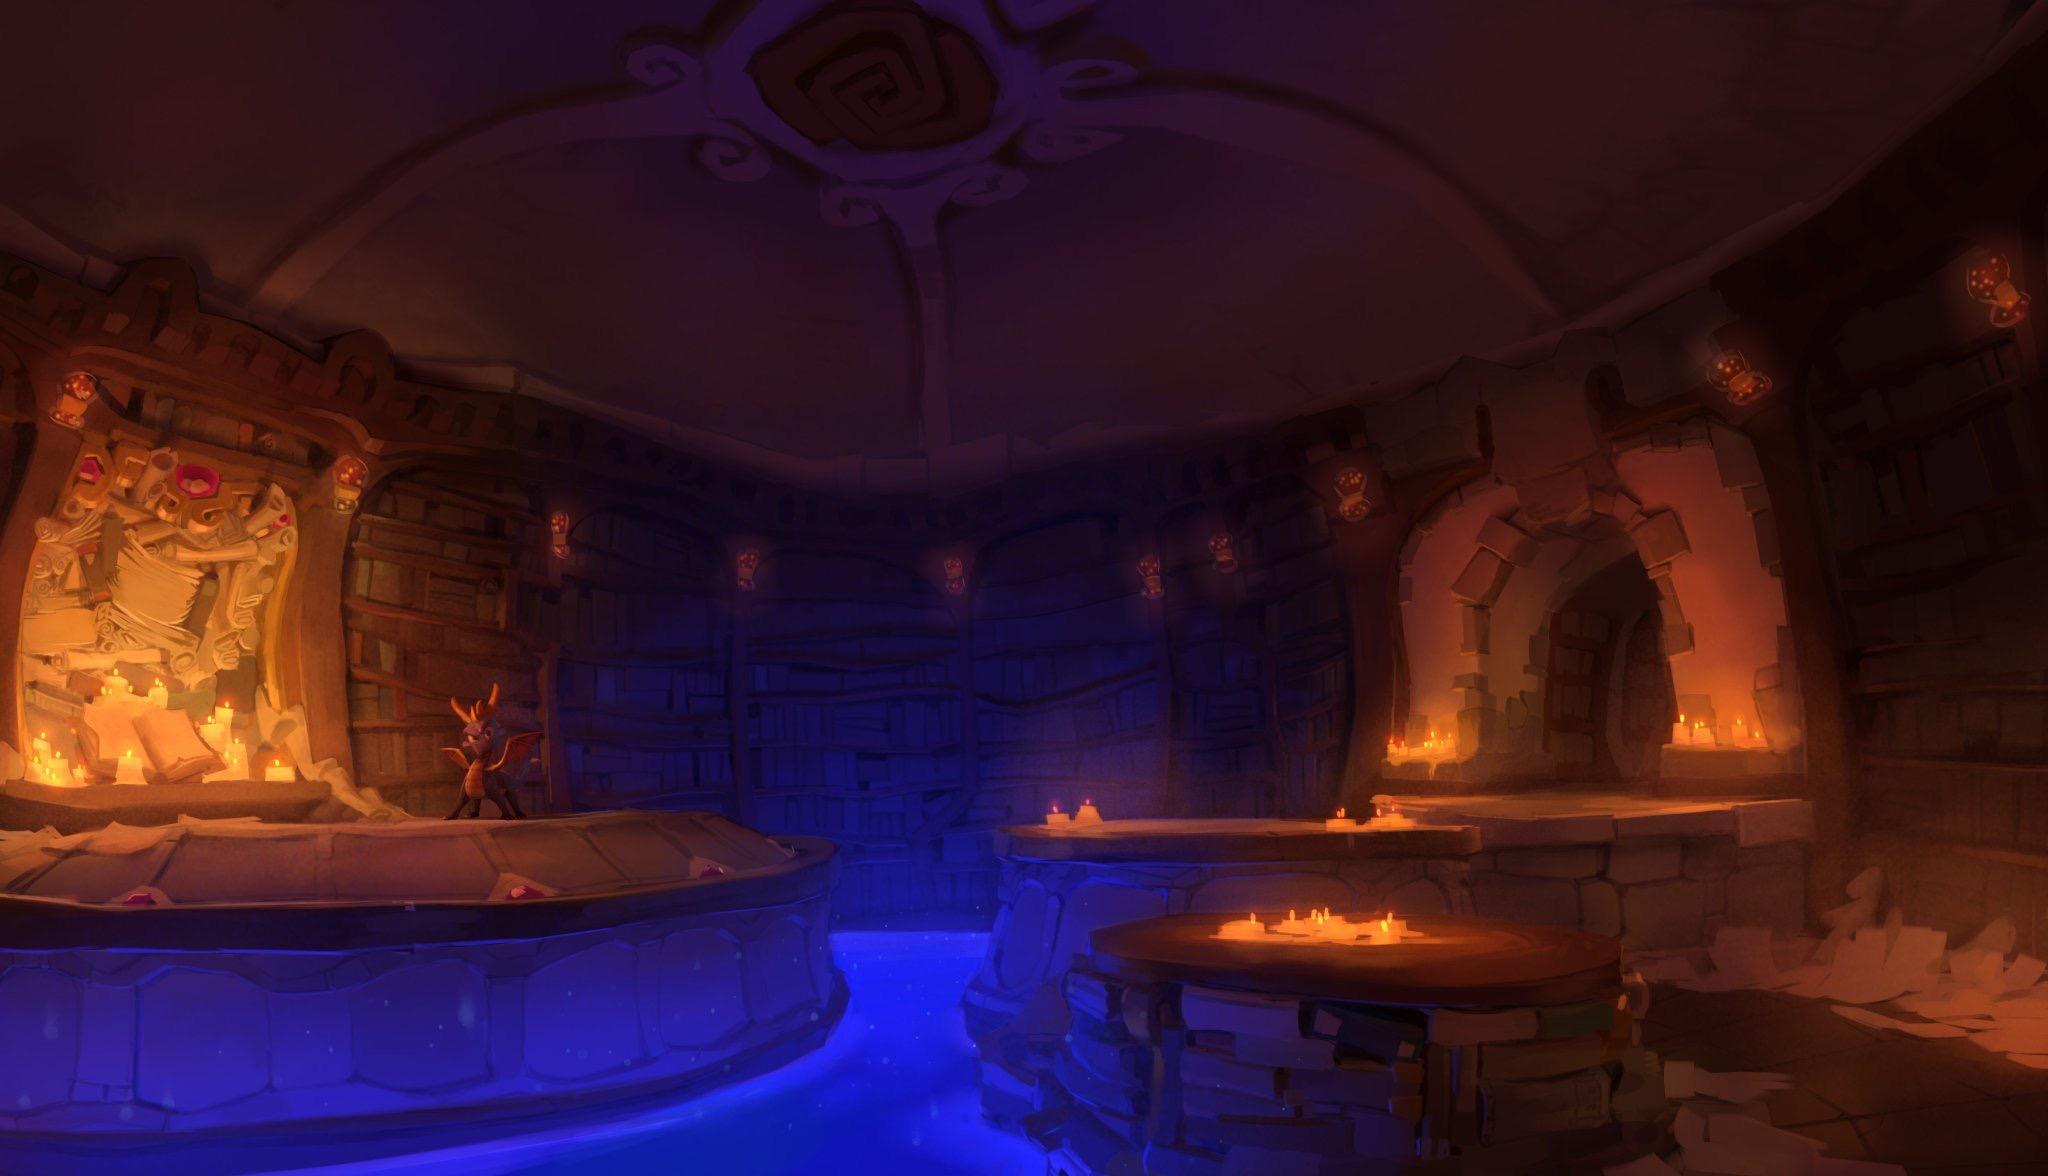 General 2048x1176 Spyro library books bookshelves video games concept art candles dragon Insomniac Games